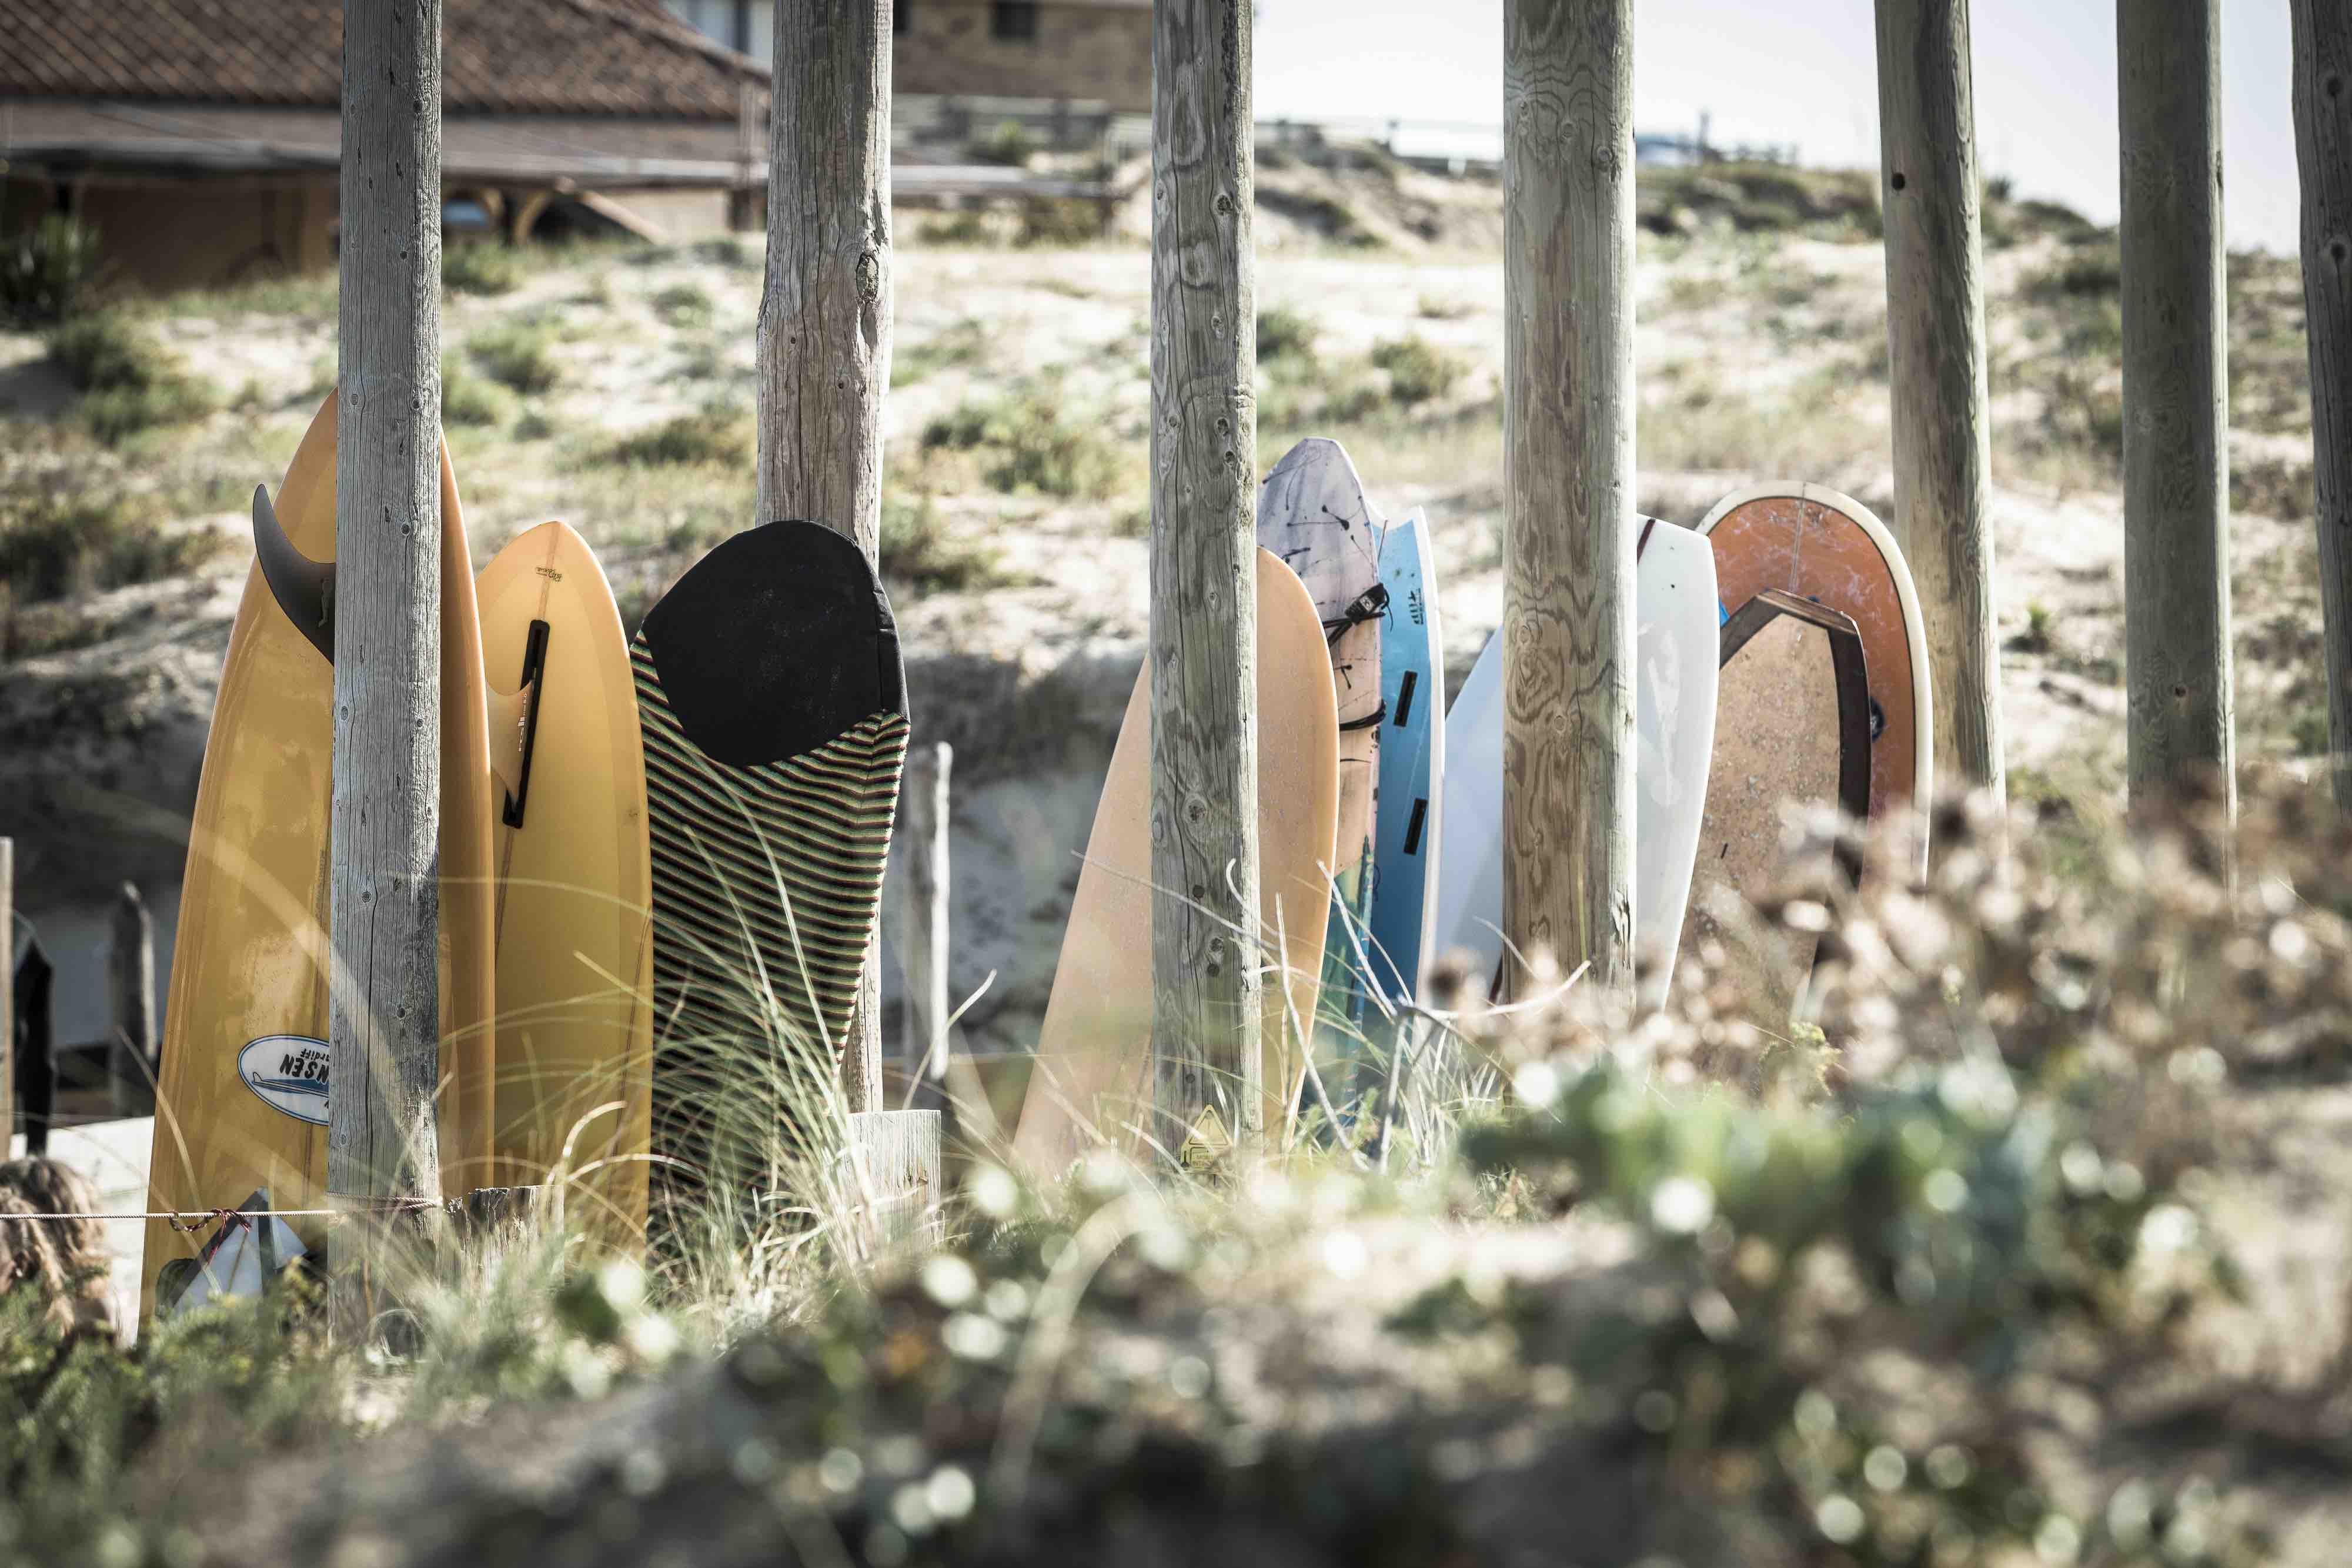 9ftboards_poullenot